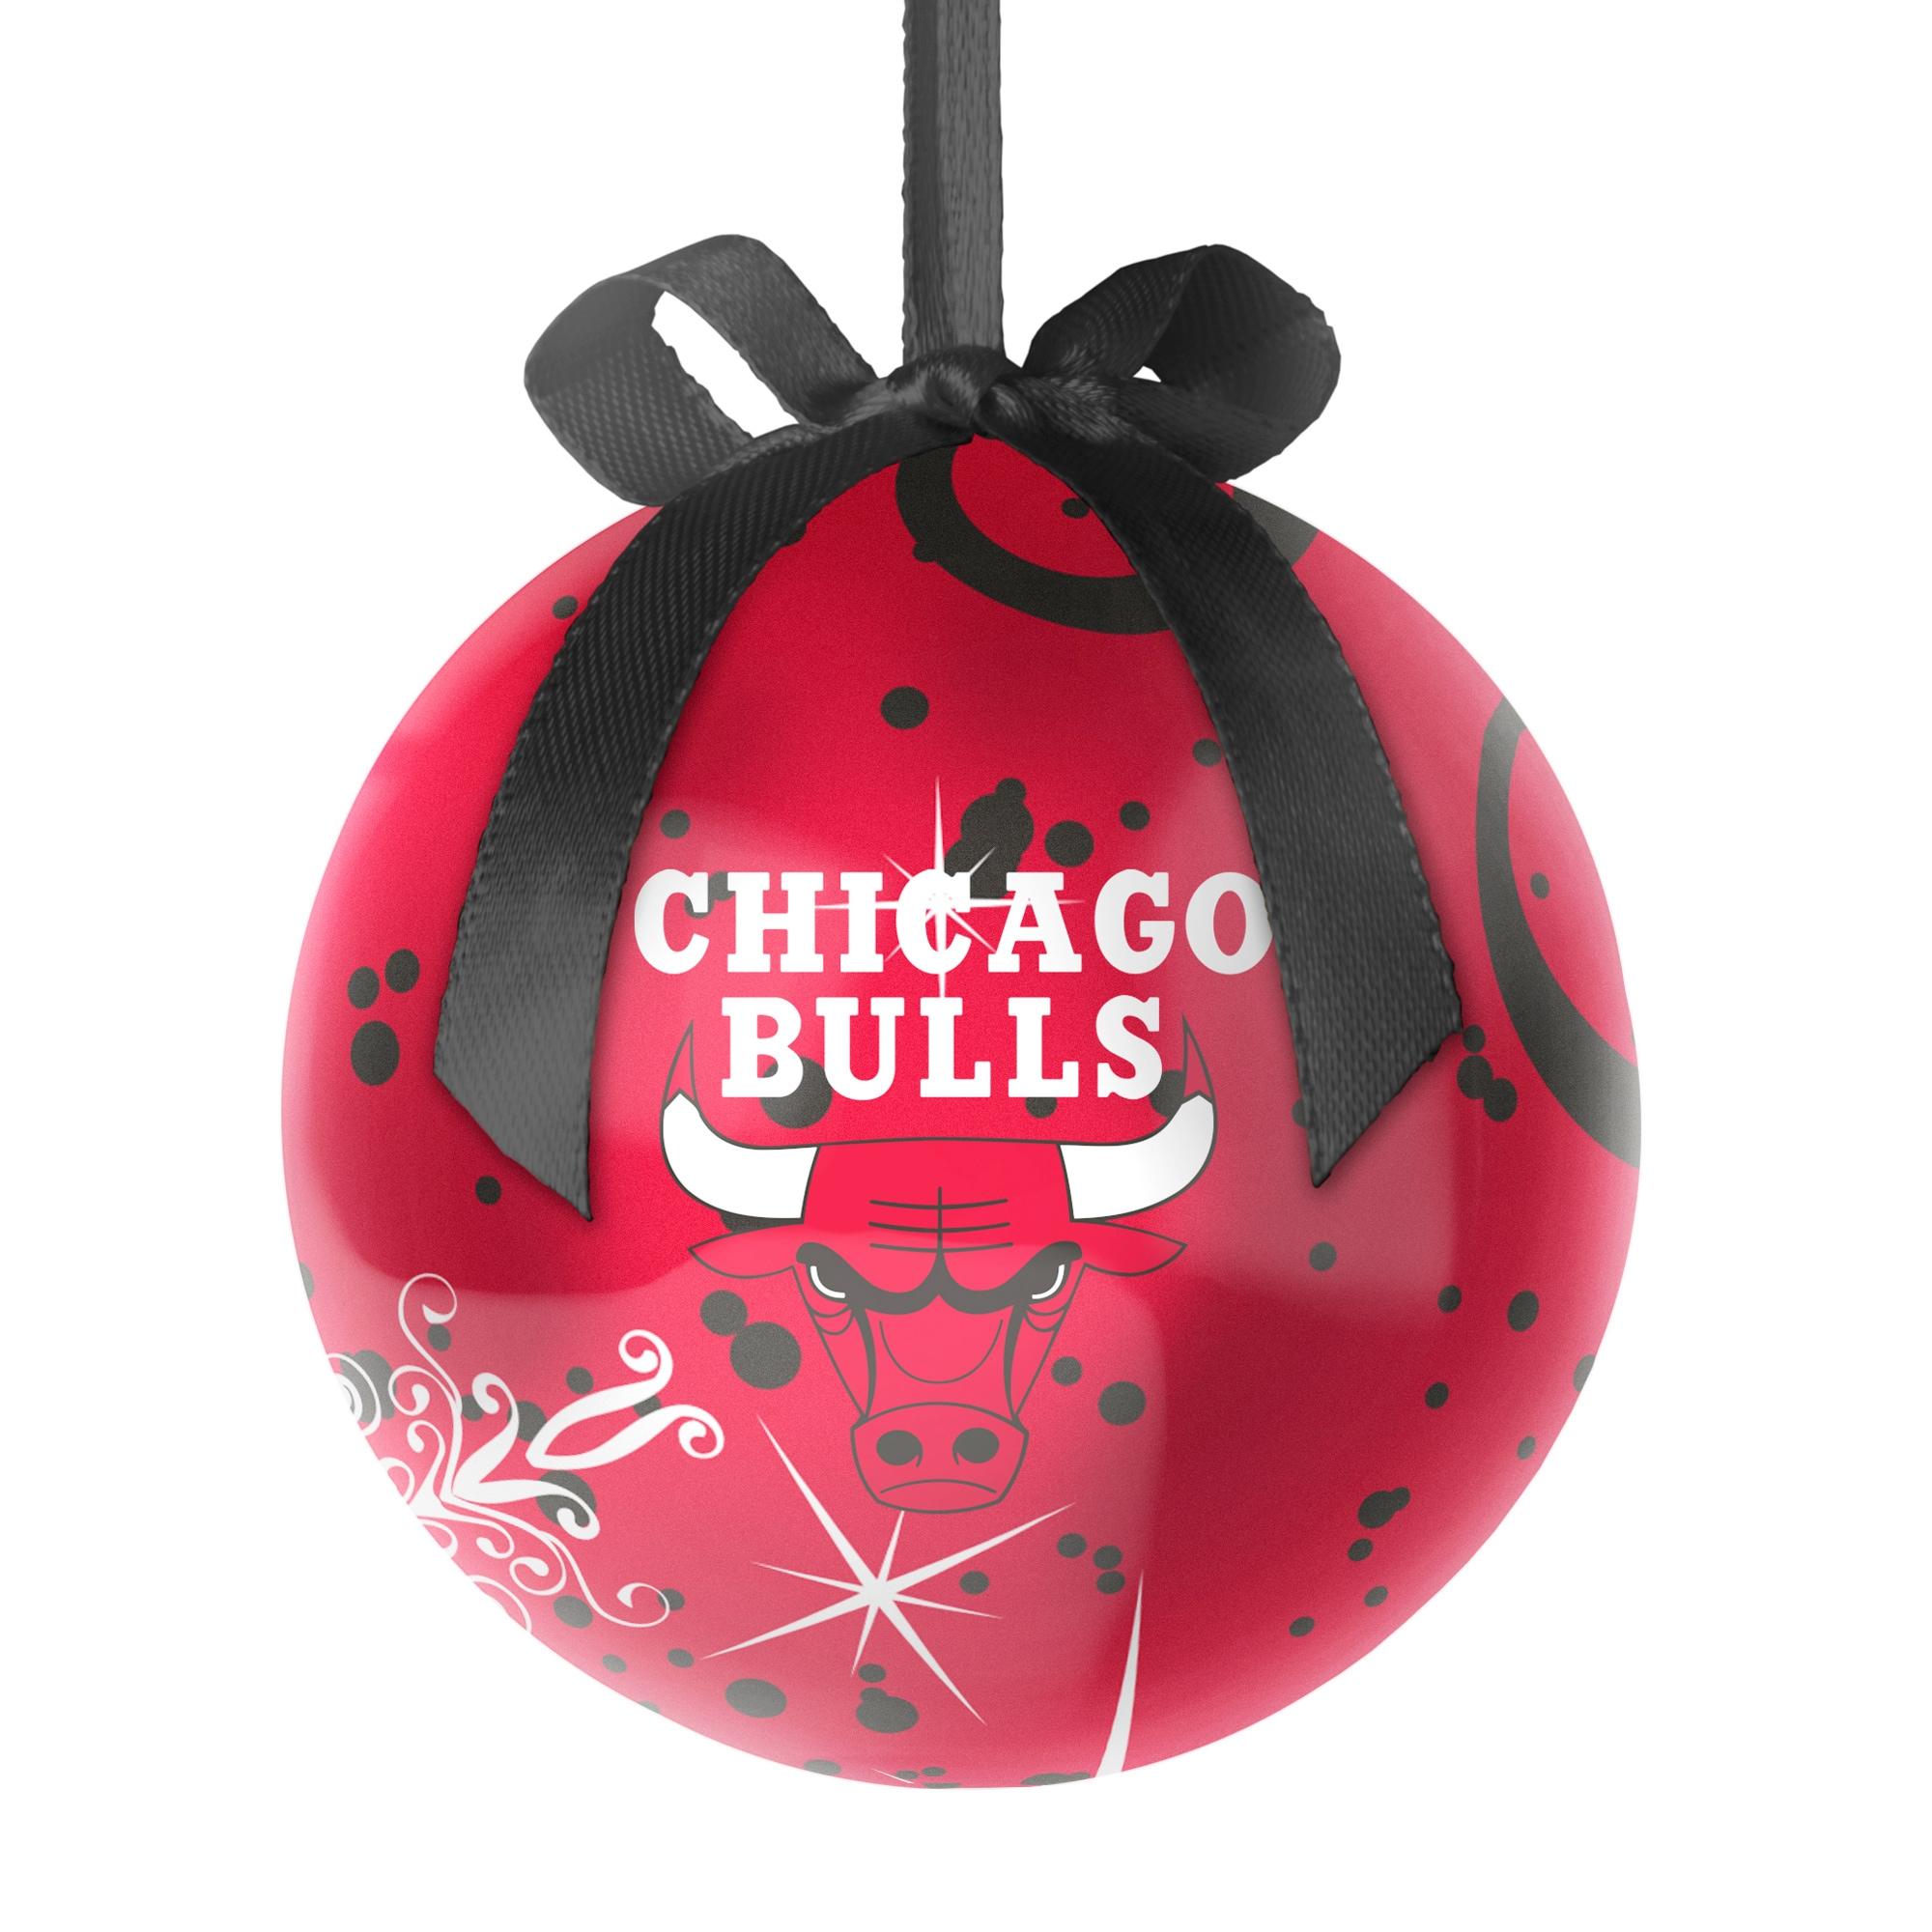 Chicago Bulls Decoupage Ball Ornament